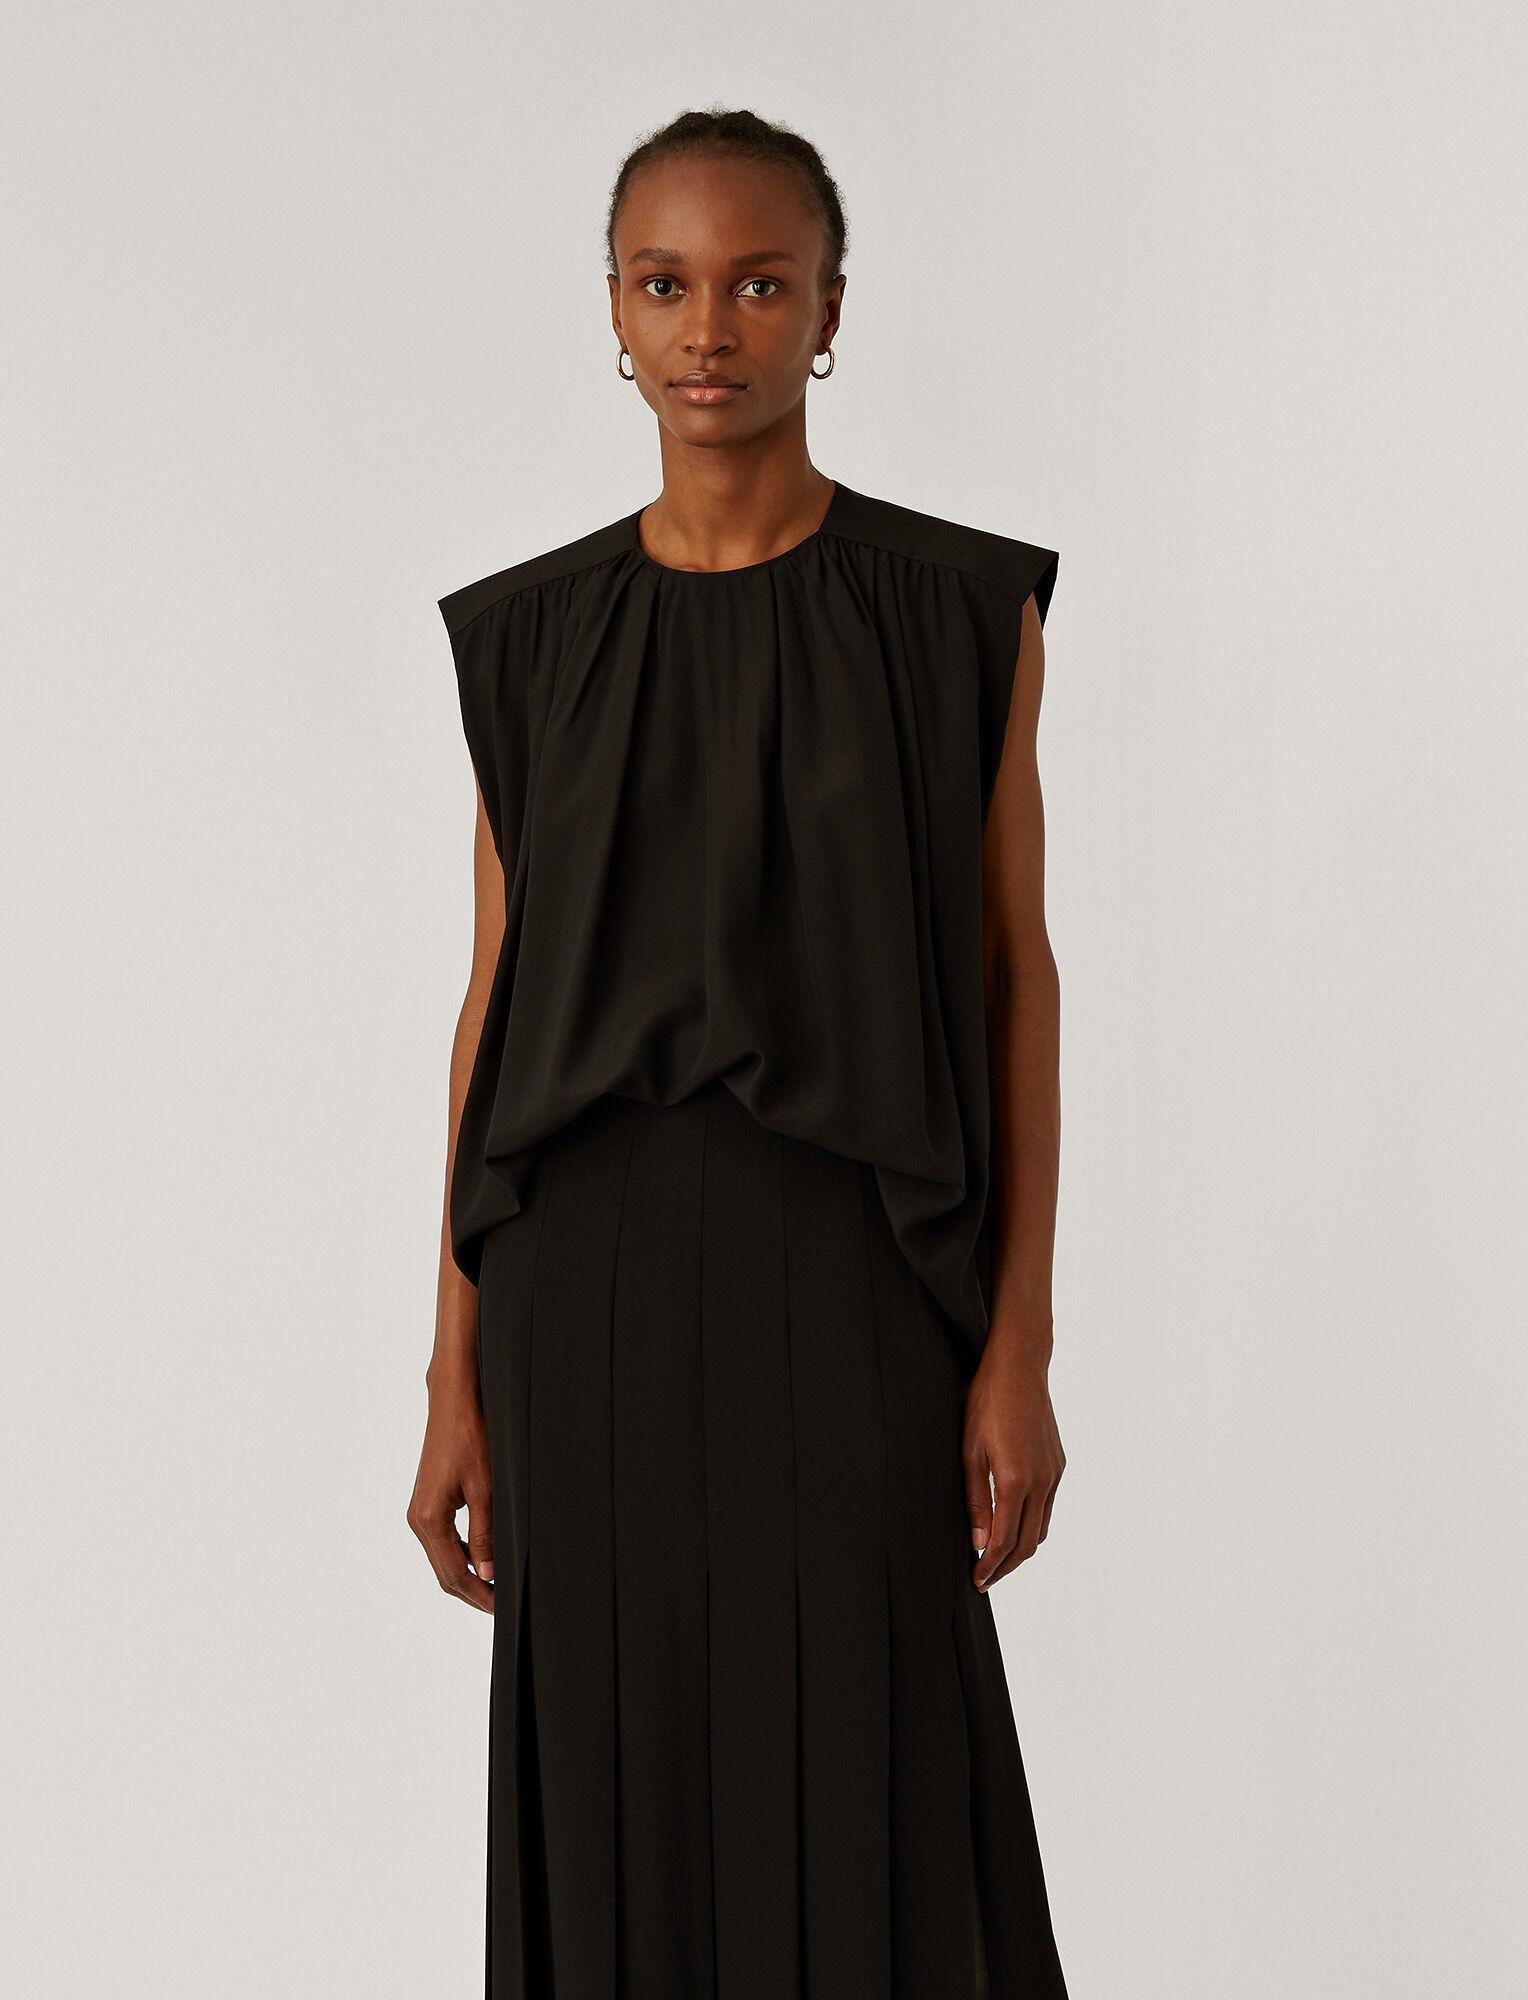 Joseph, Blakey Light Silk Blouse, in Black